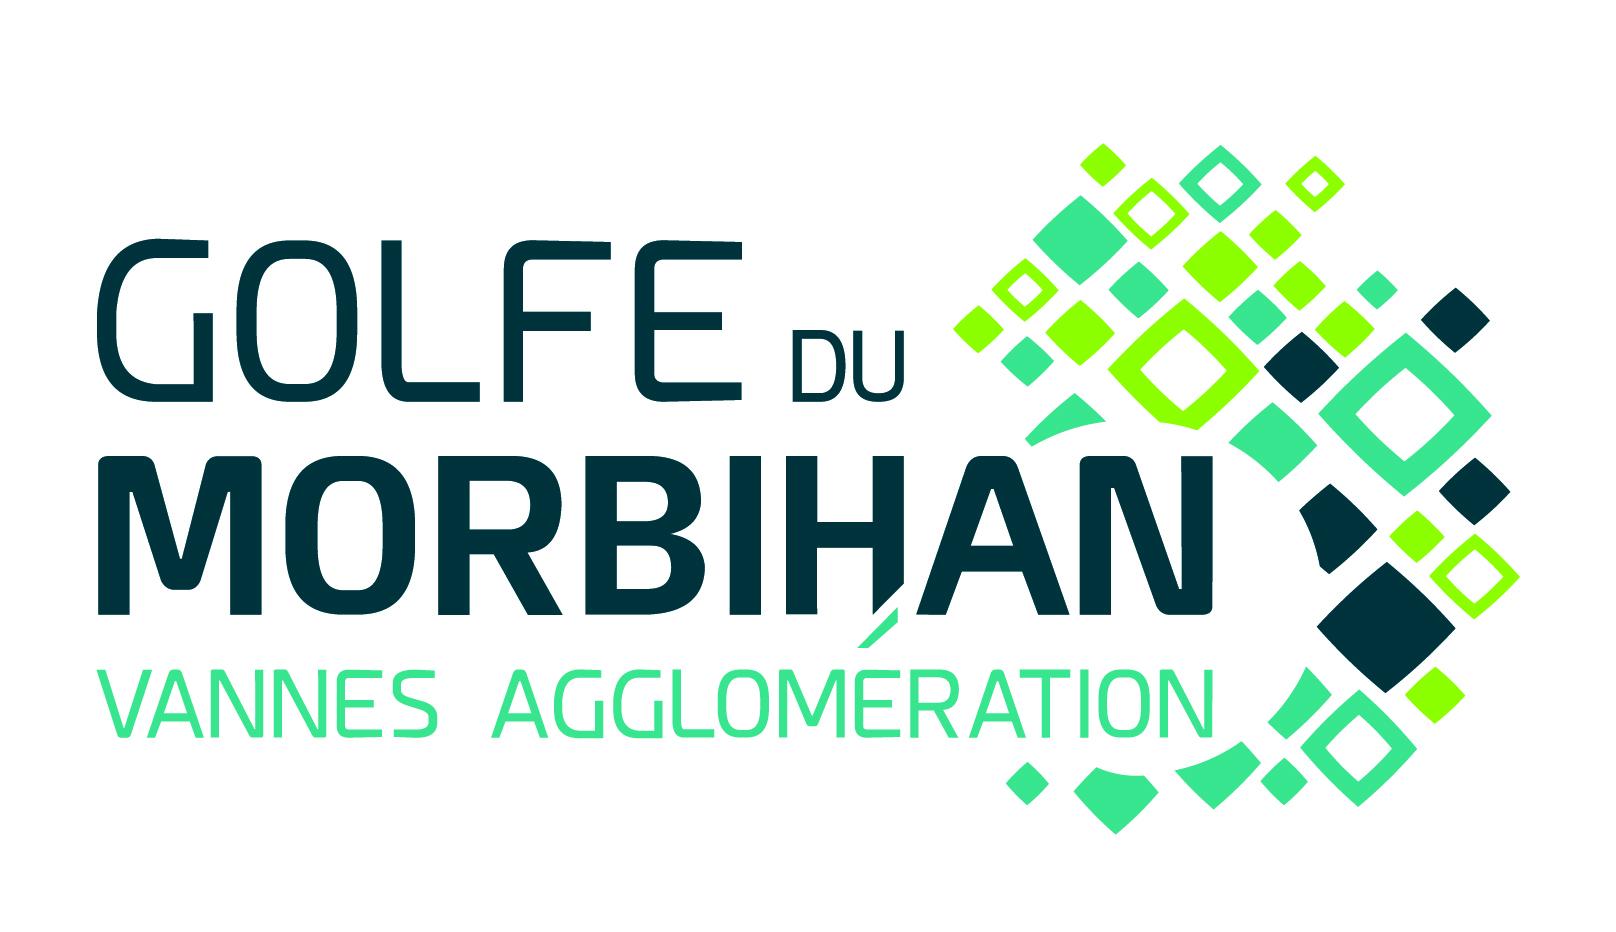 Golfe du Morbihan - Vannes agglomération